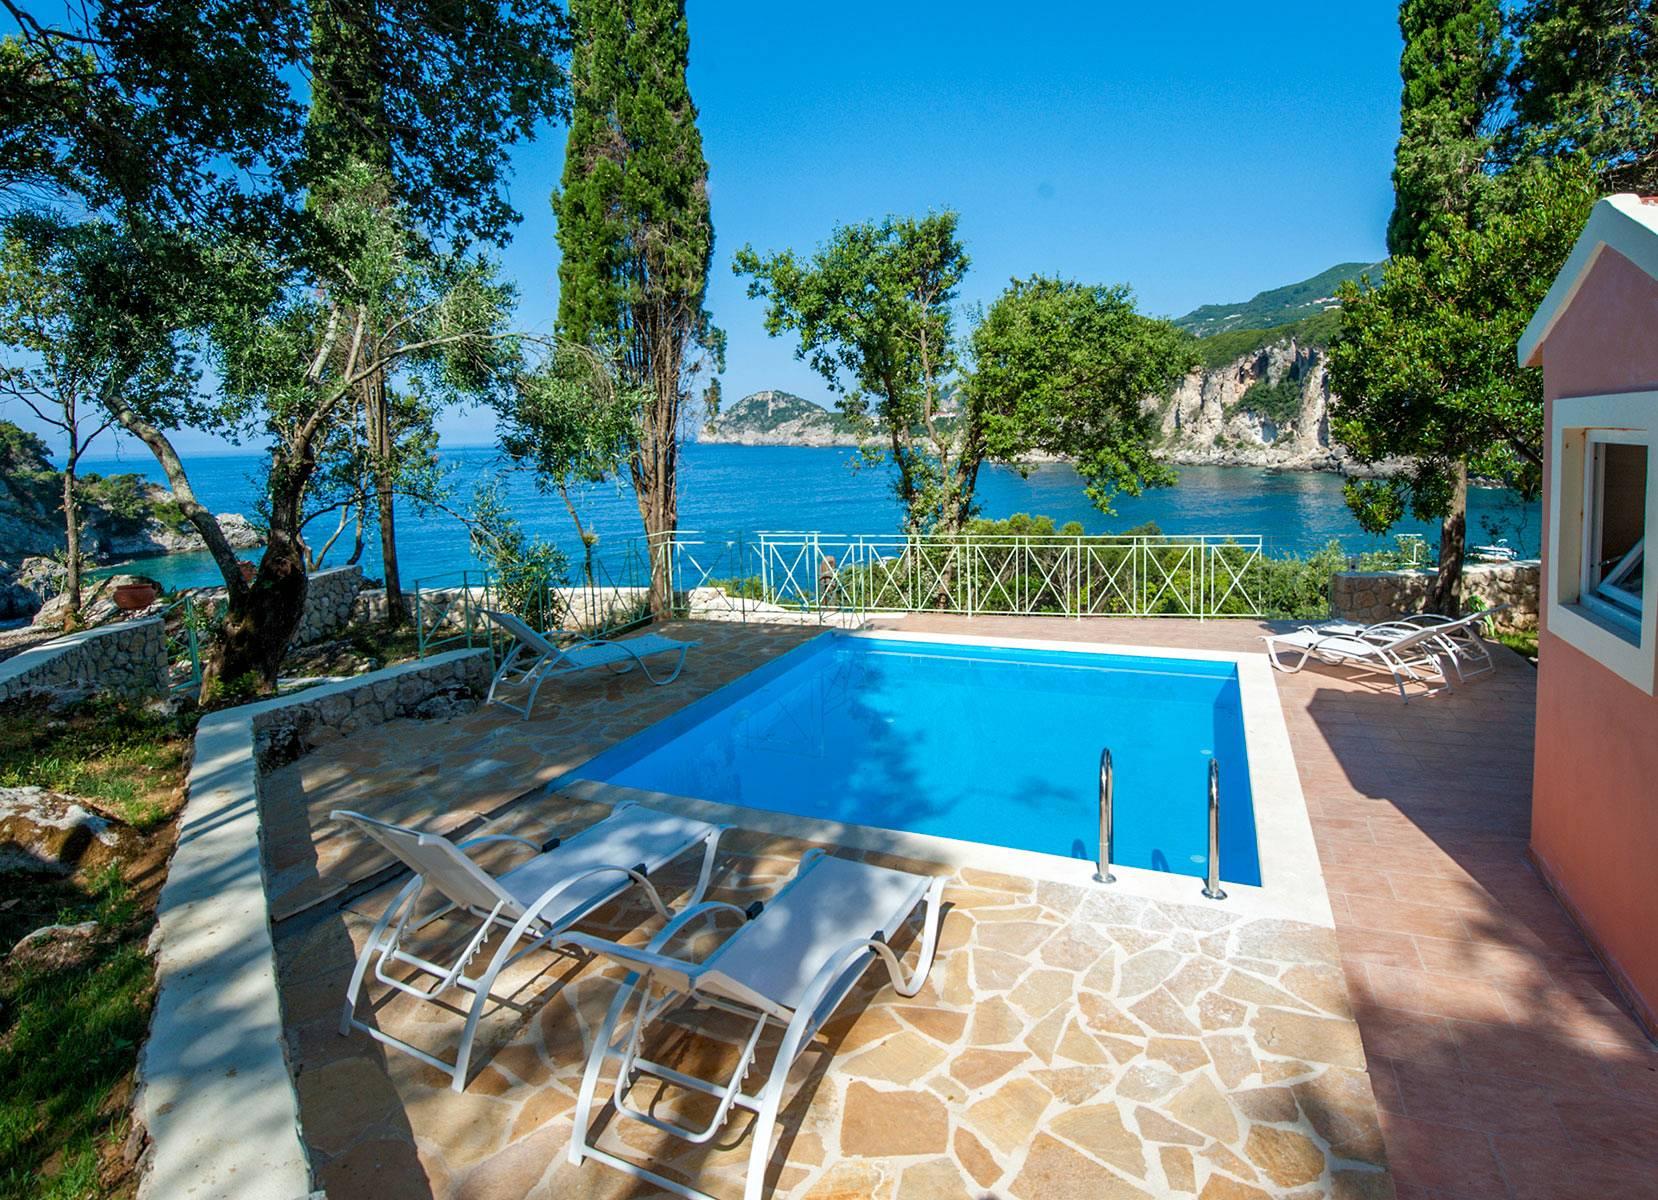 Hotel Aqua Blue Corfu, Greece